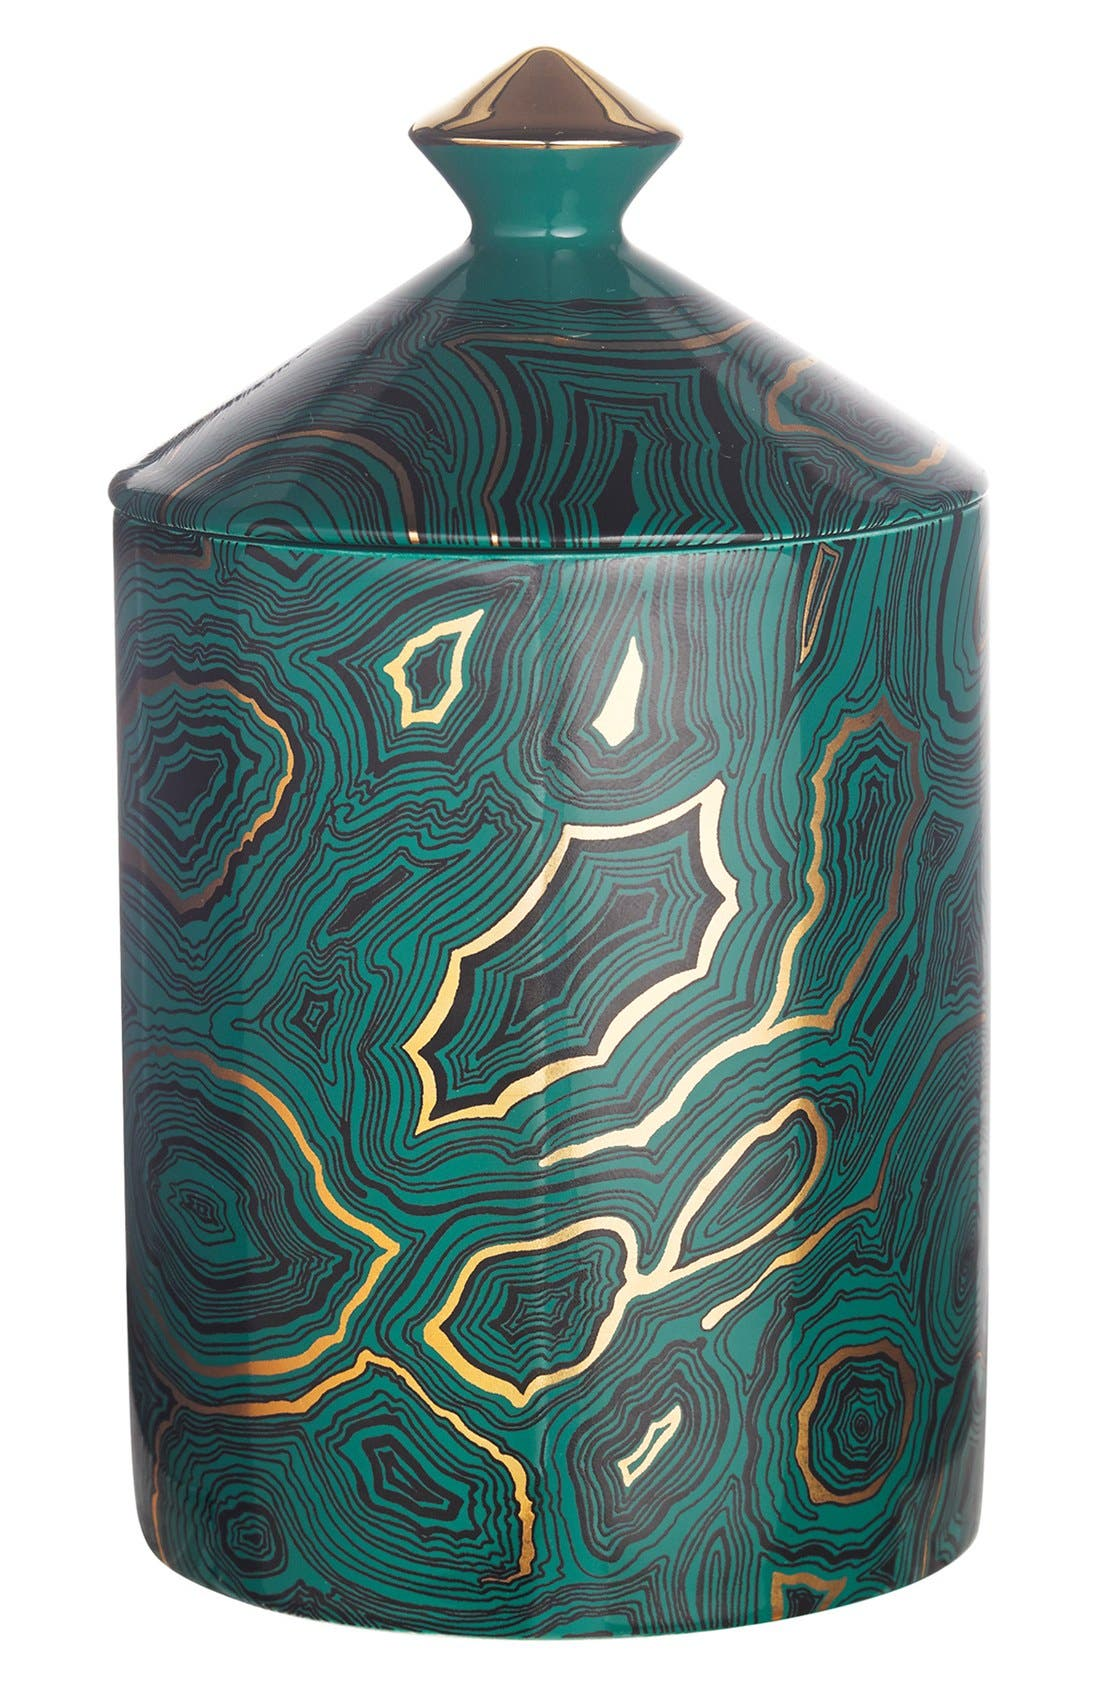 'Malachite' Lidded Candle,                         Main,                         color, No Color